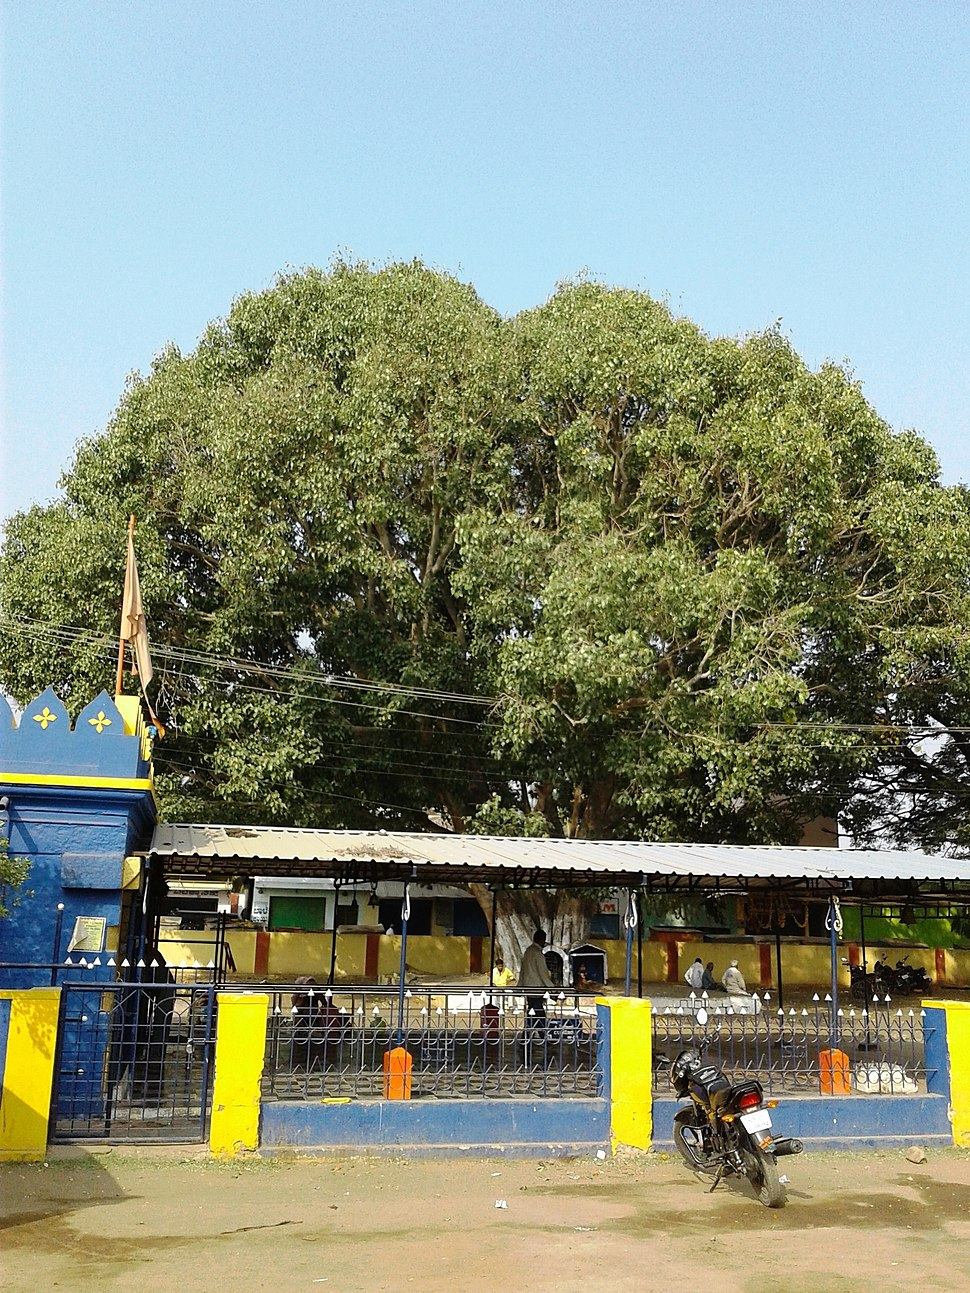 Chamarajanagar.Marigidi Temple.Old Busstation